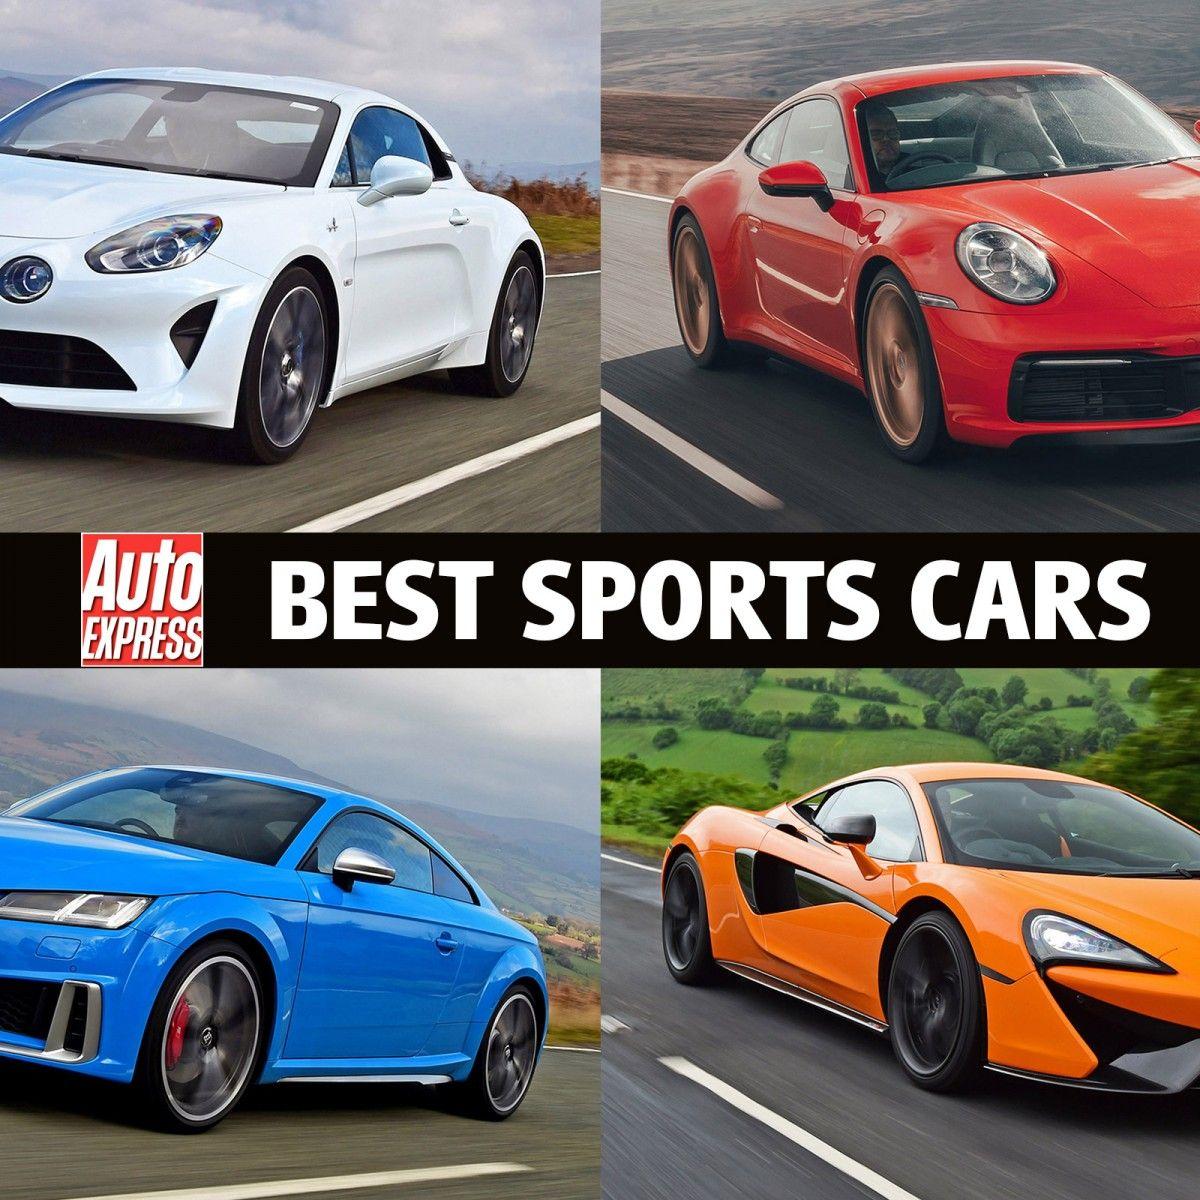 Elegant 2 Seater Sports Cars for Sale Near Me di 2020